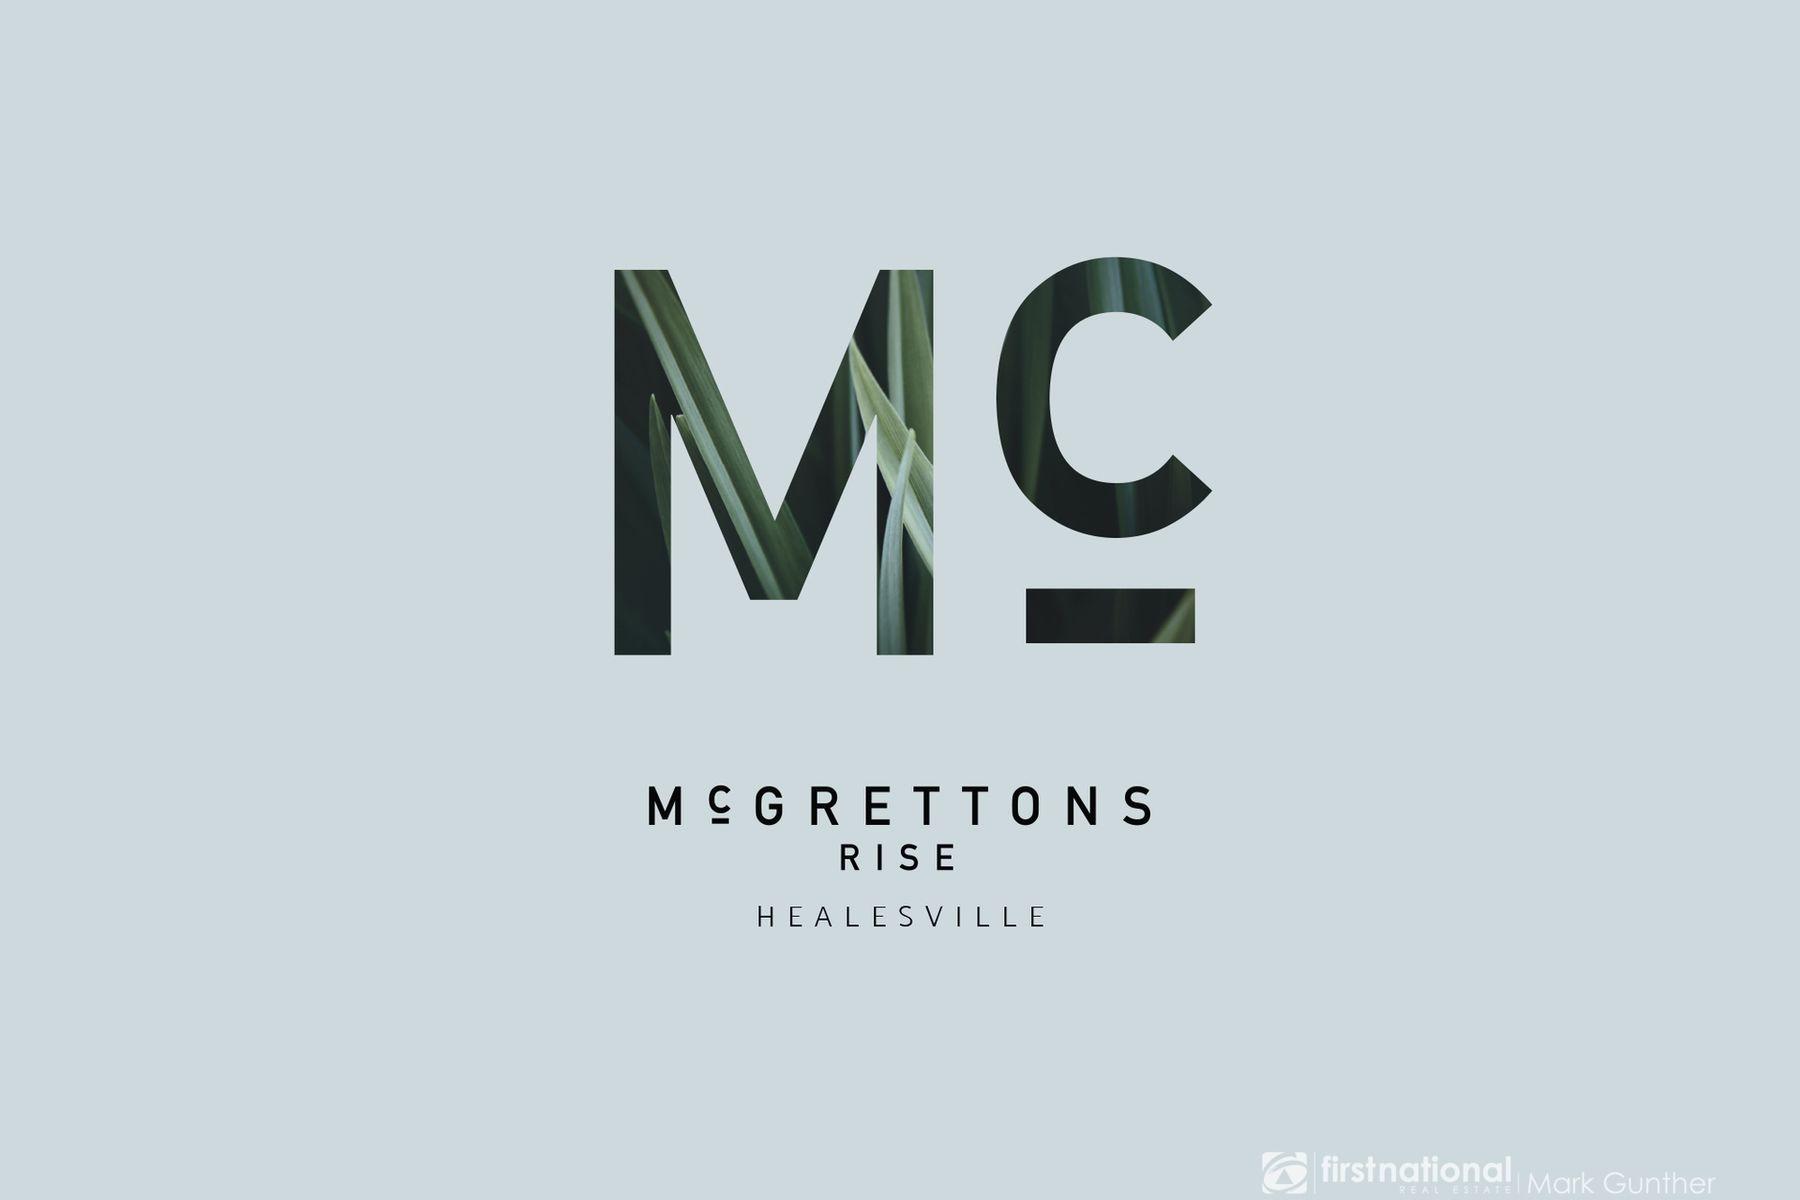 Lot 3/29 Mcgrettons Road, Healesville, VIC 3777